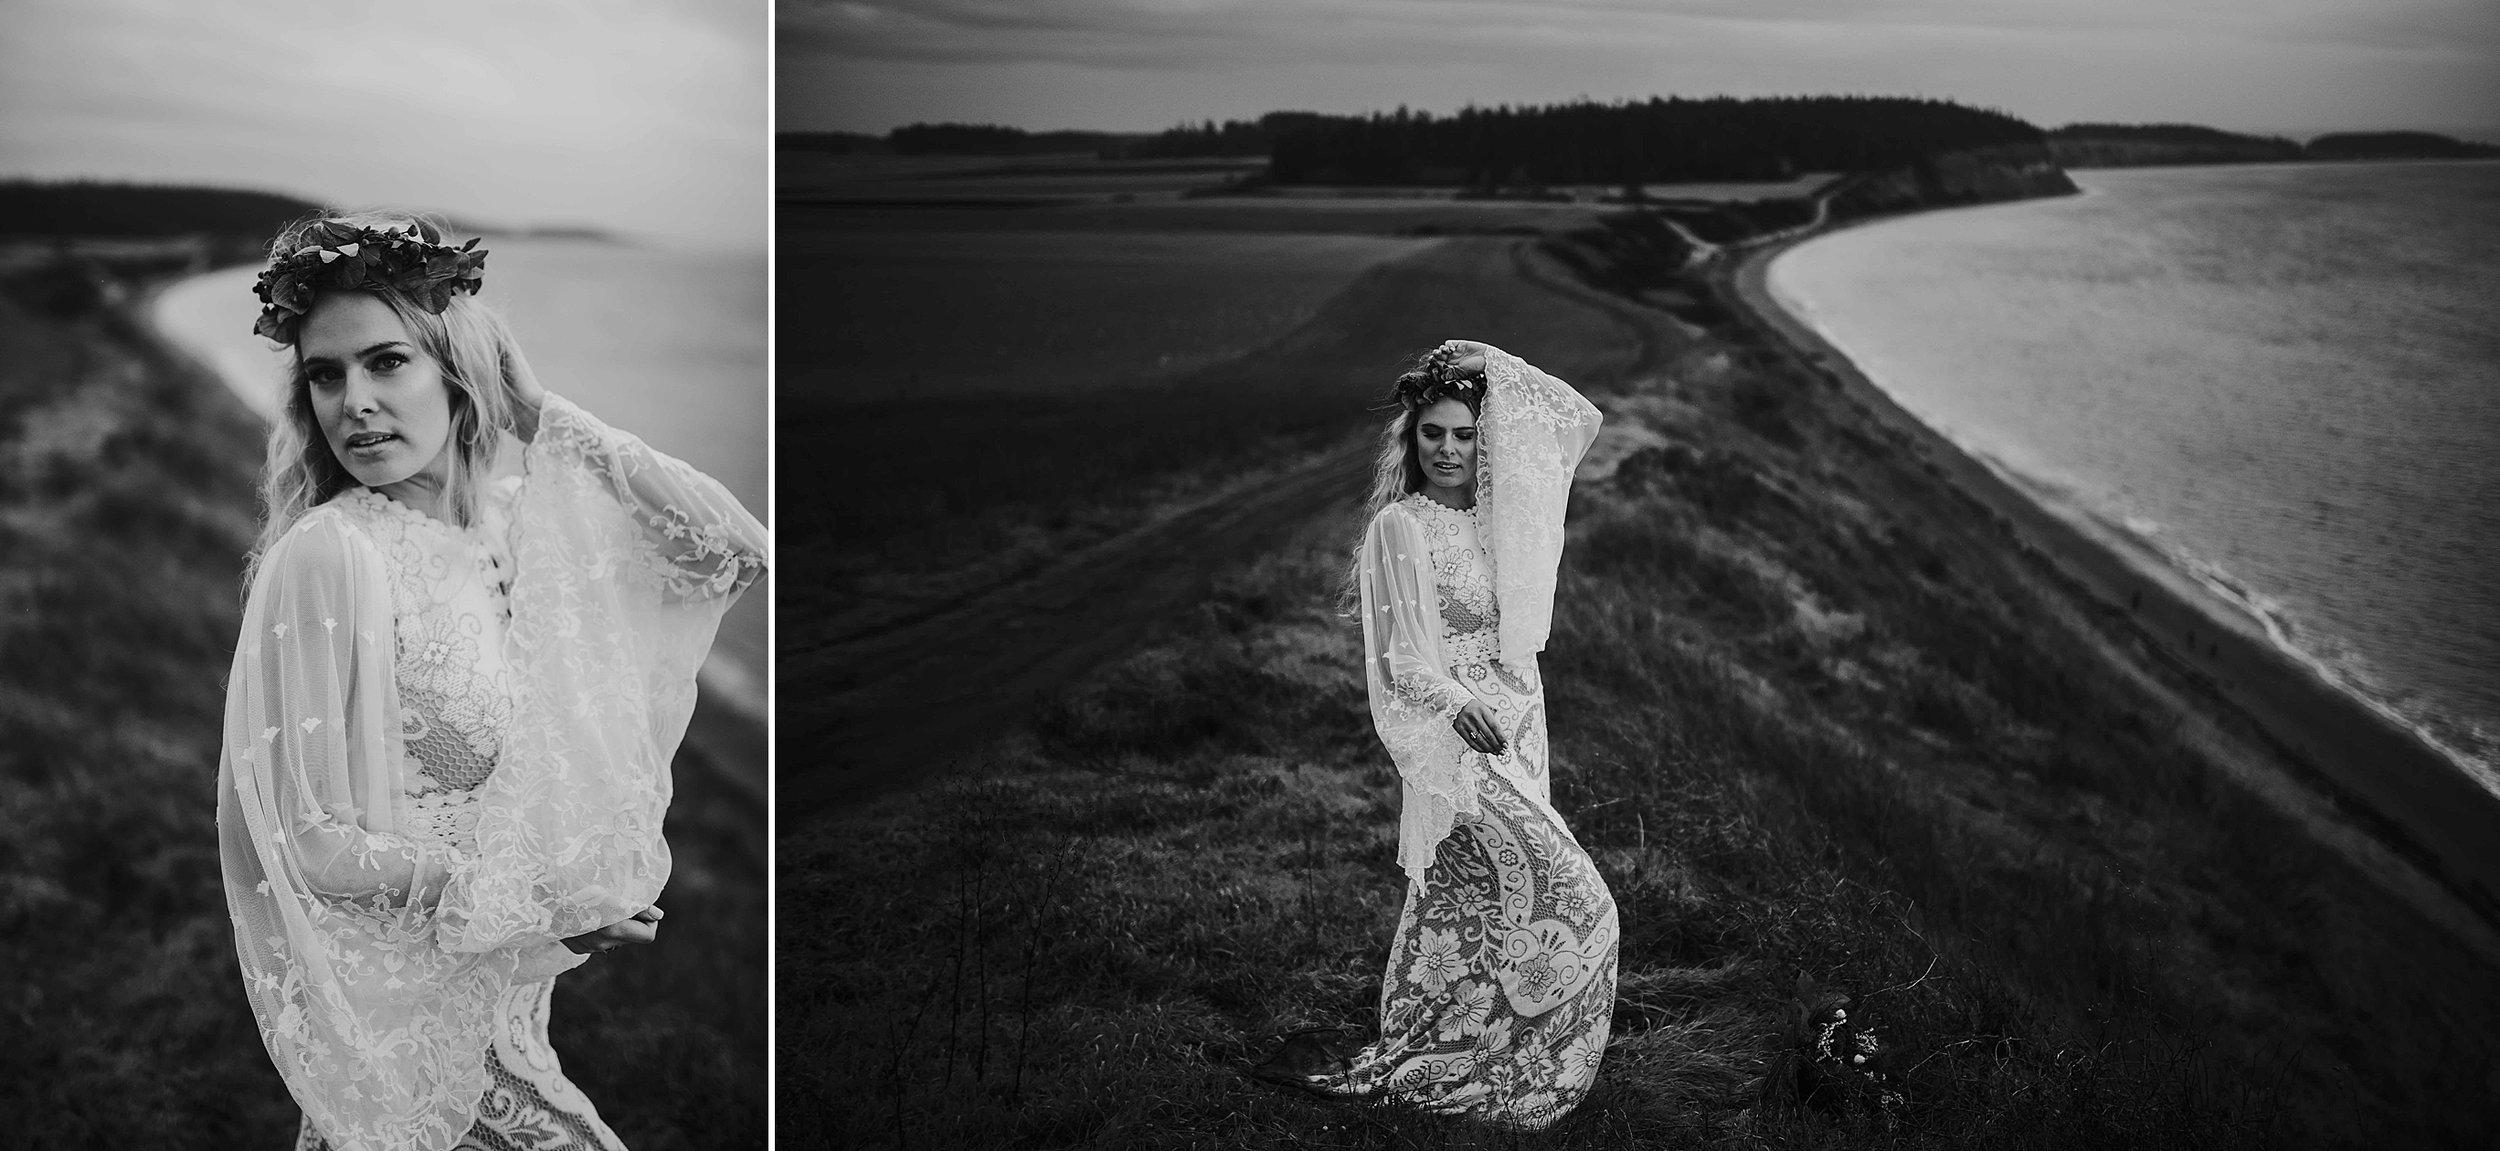 Wedding-photographer-J HODGES PHOTOGRAPHY_0221.jpg